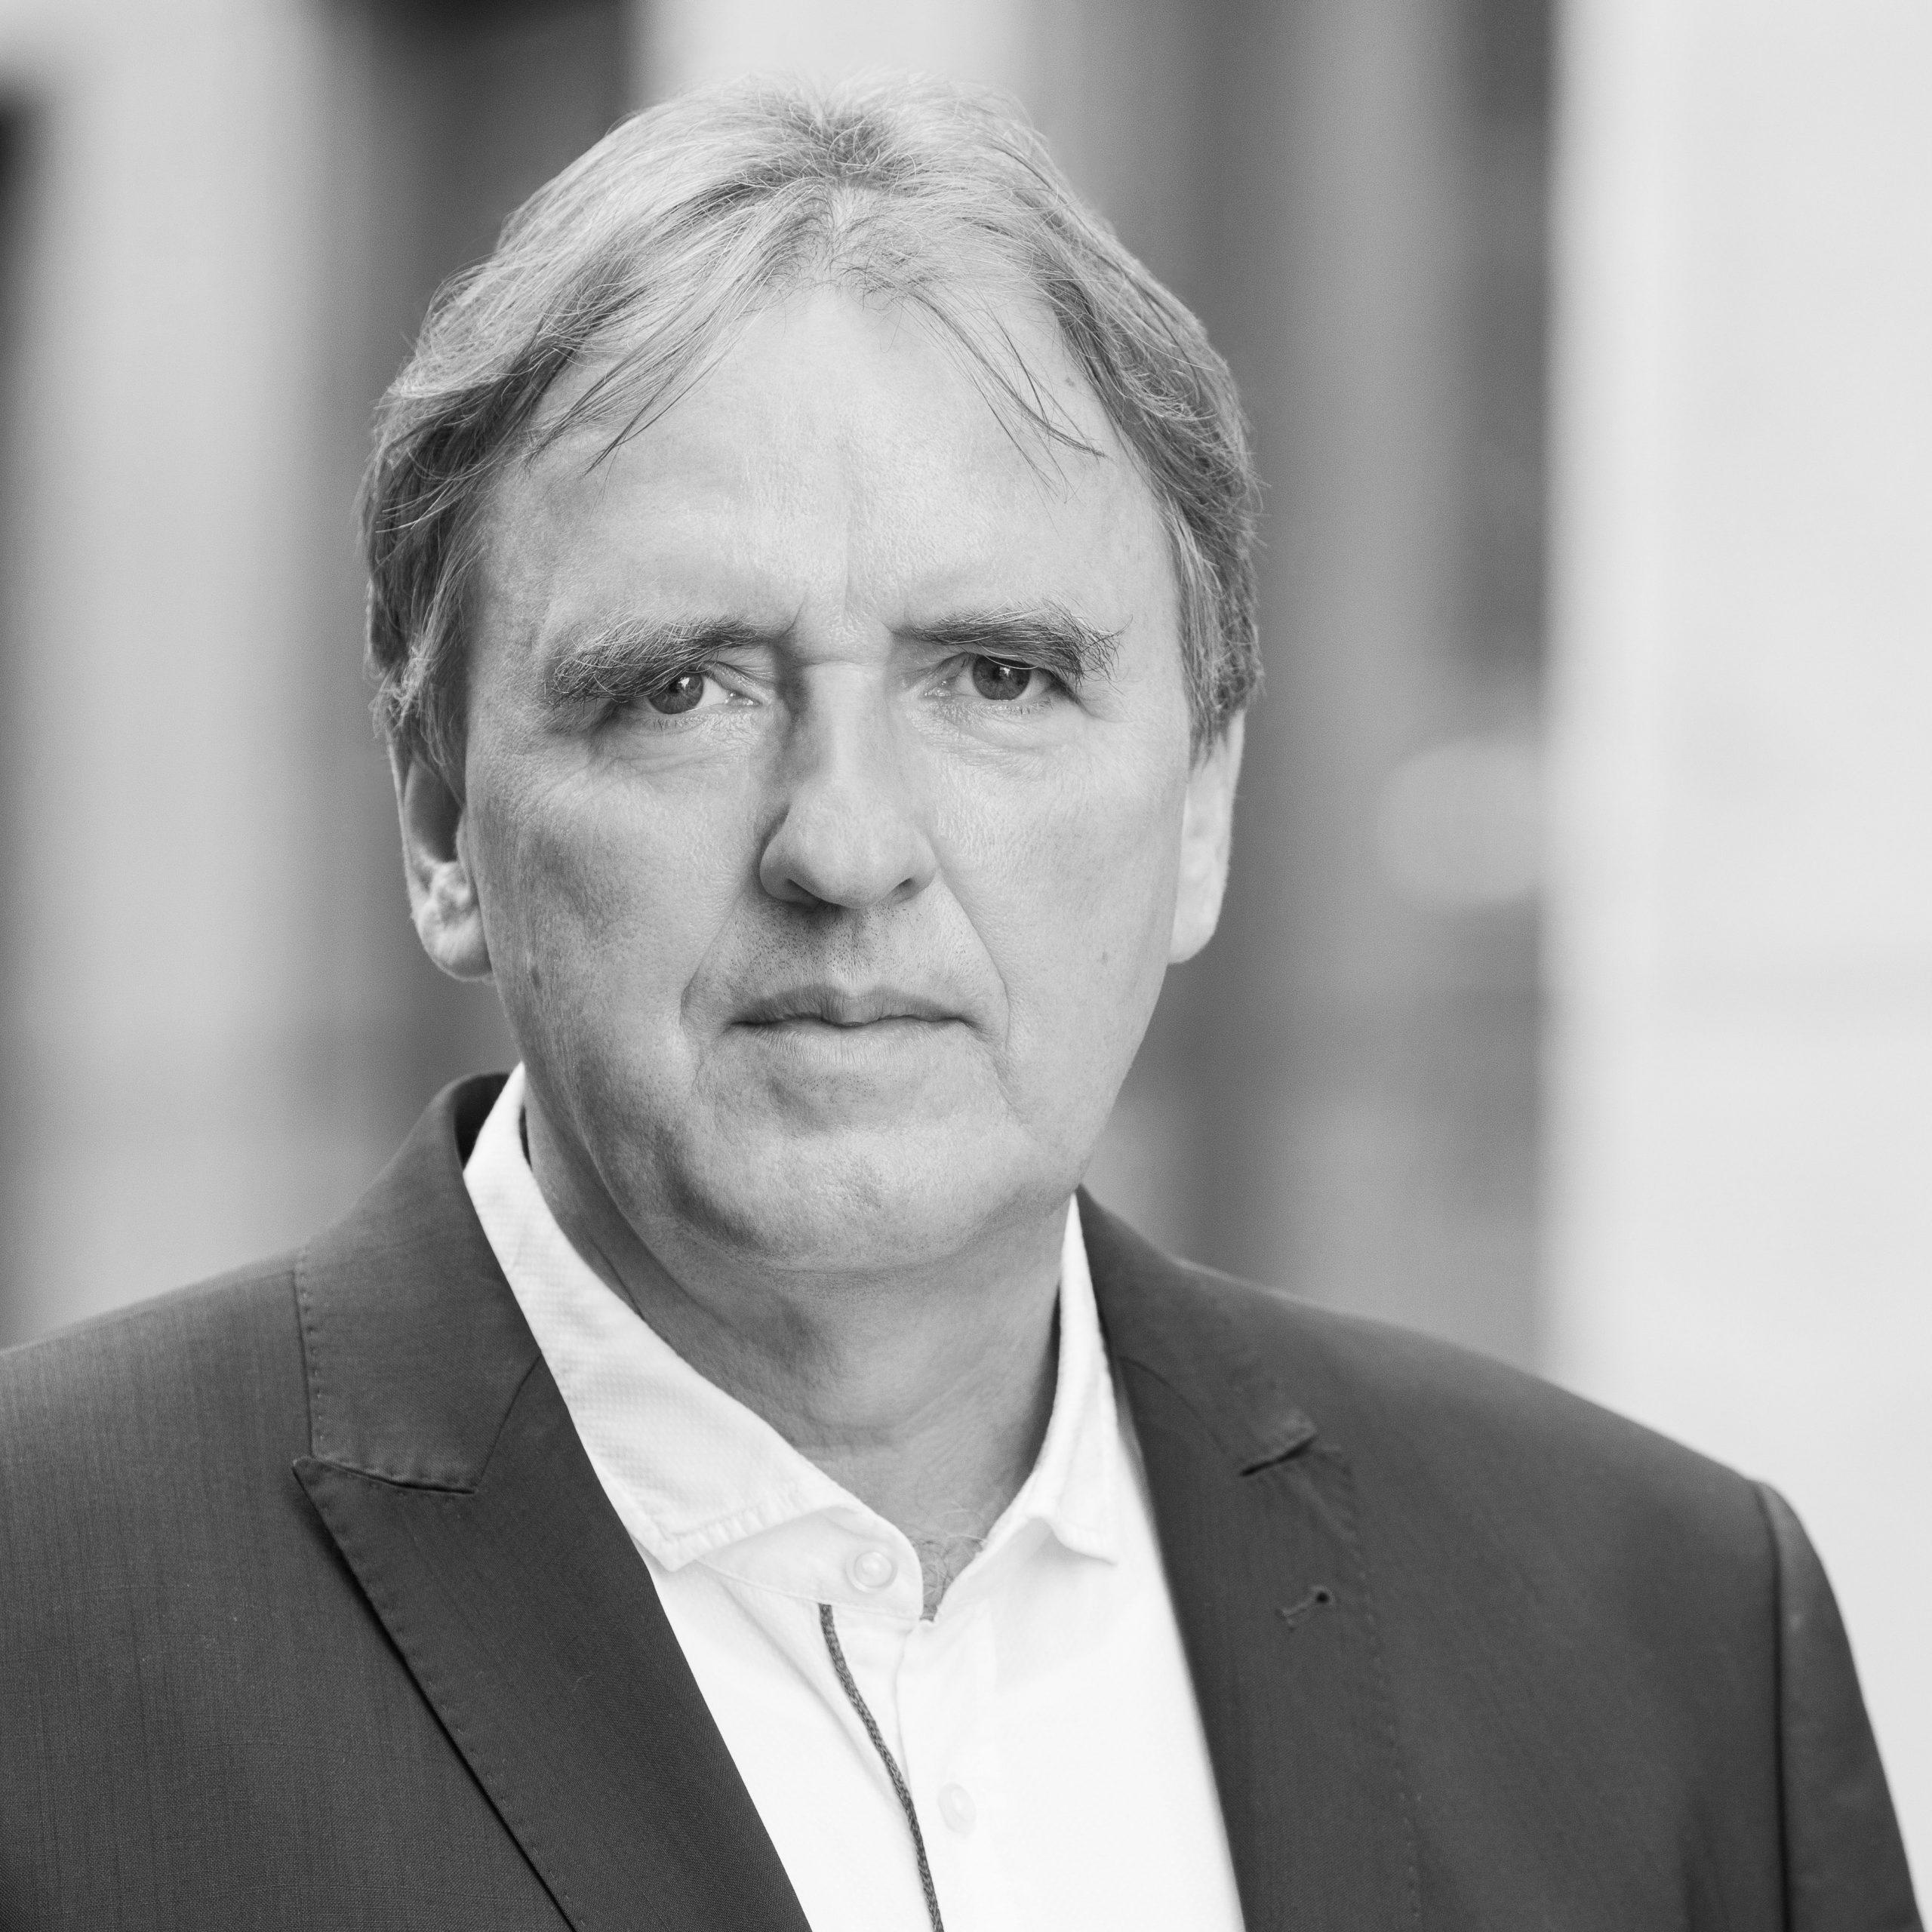 Prof. Norbert Pohlmann